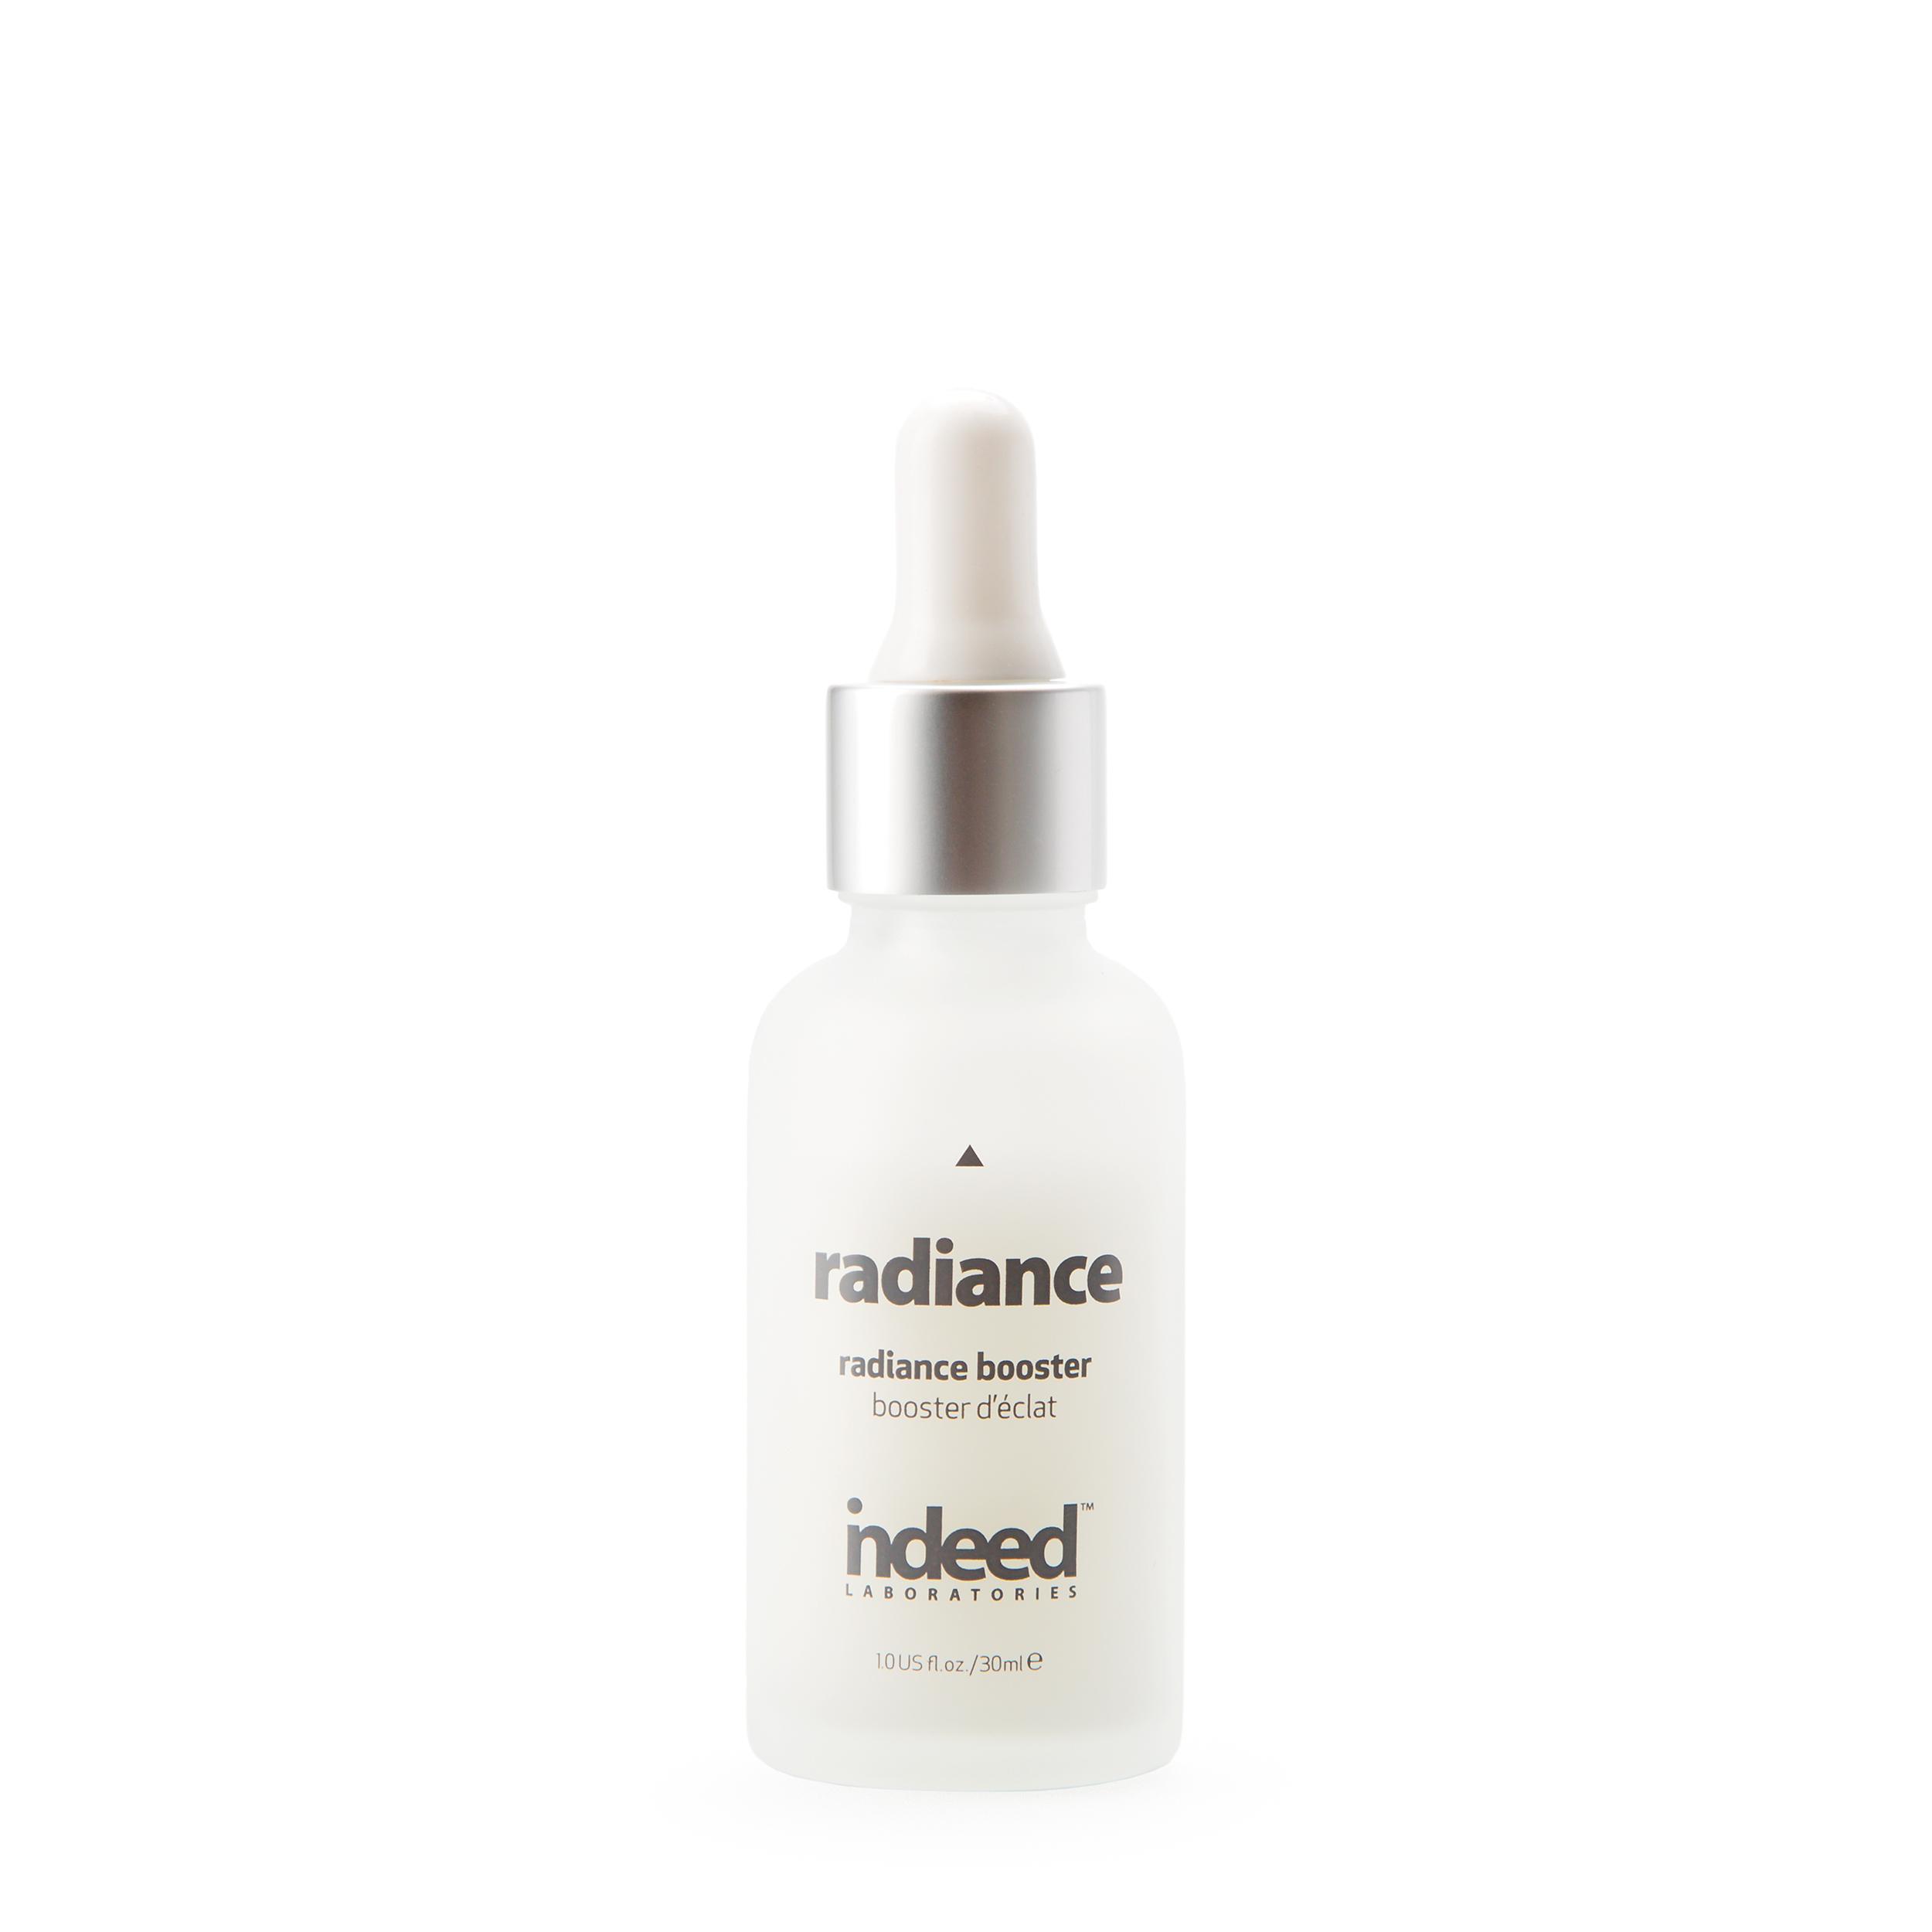 Indeed laboratories Сыворотка для сияния кожи «Radiance Booster» 30 мл фото